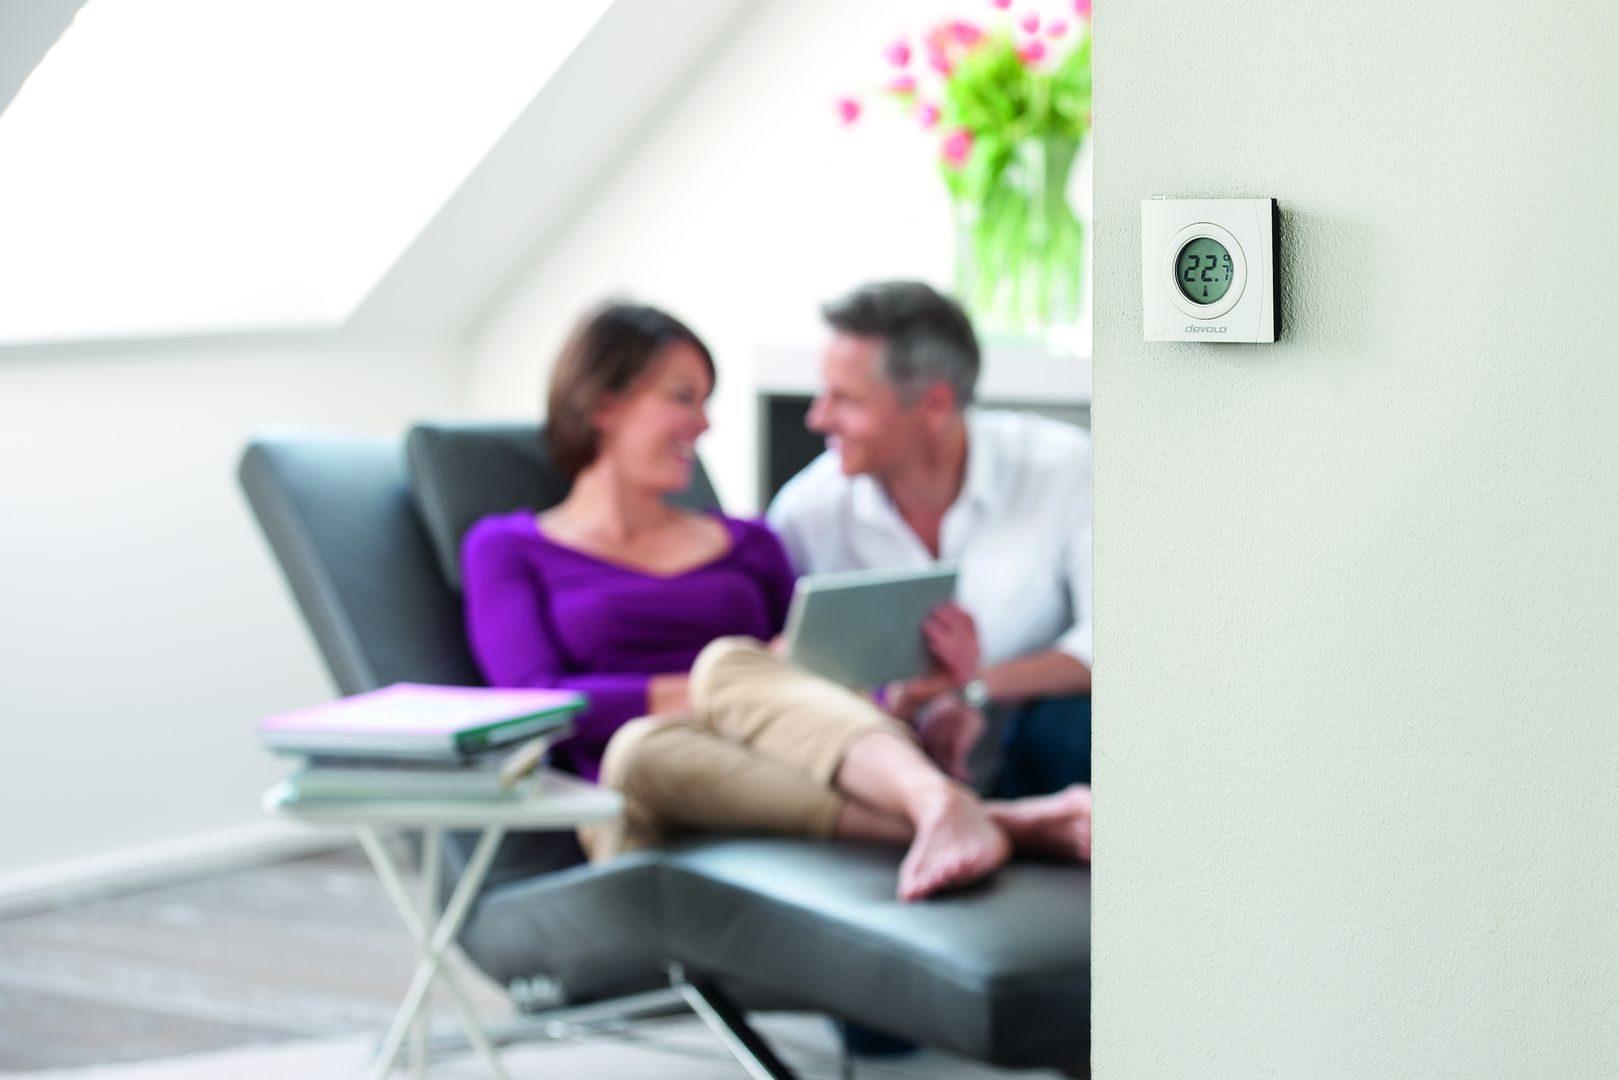 devolo-Home-Control-Room-Thermostat-livingroom